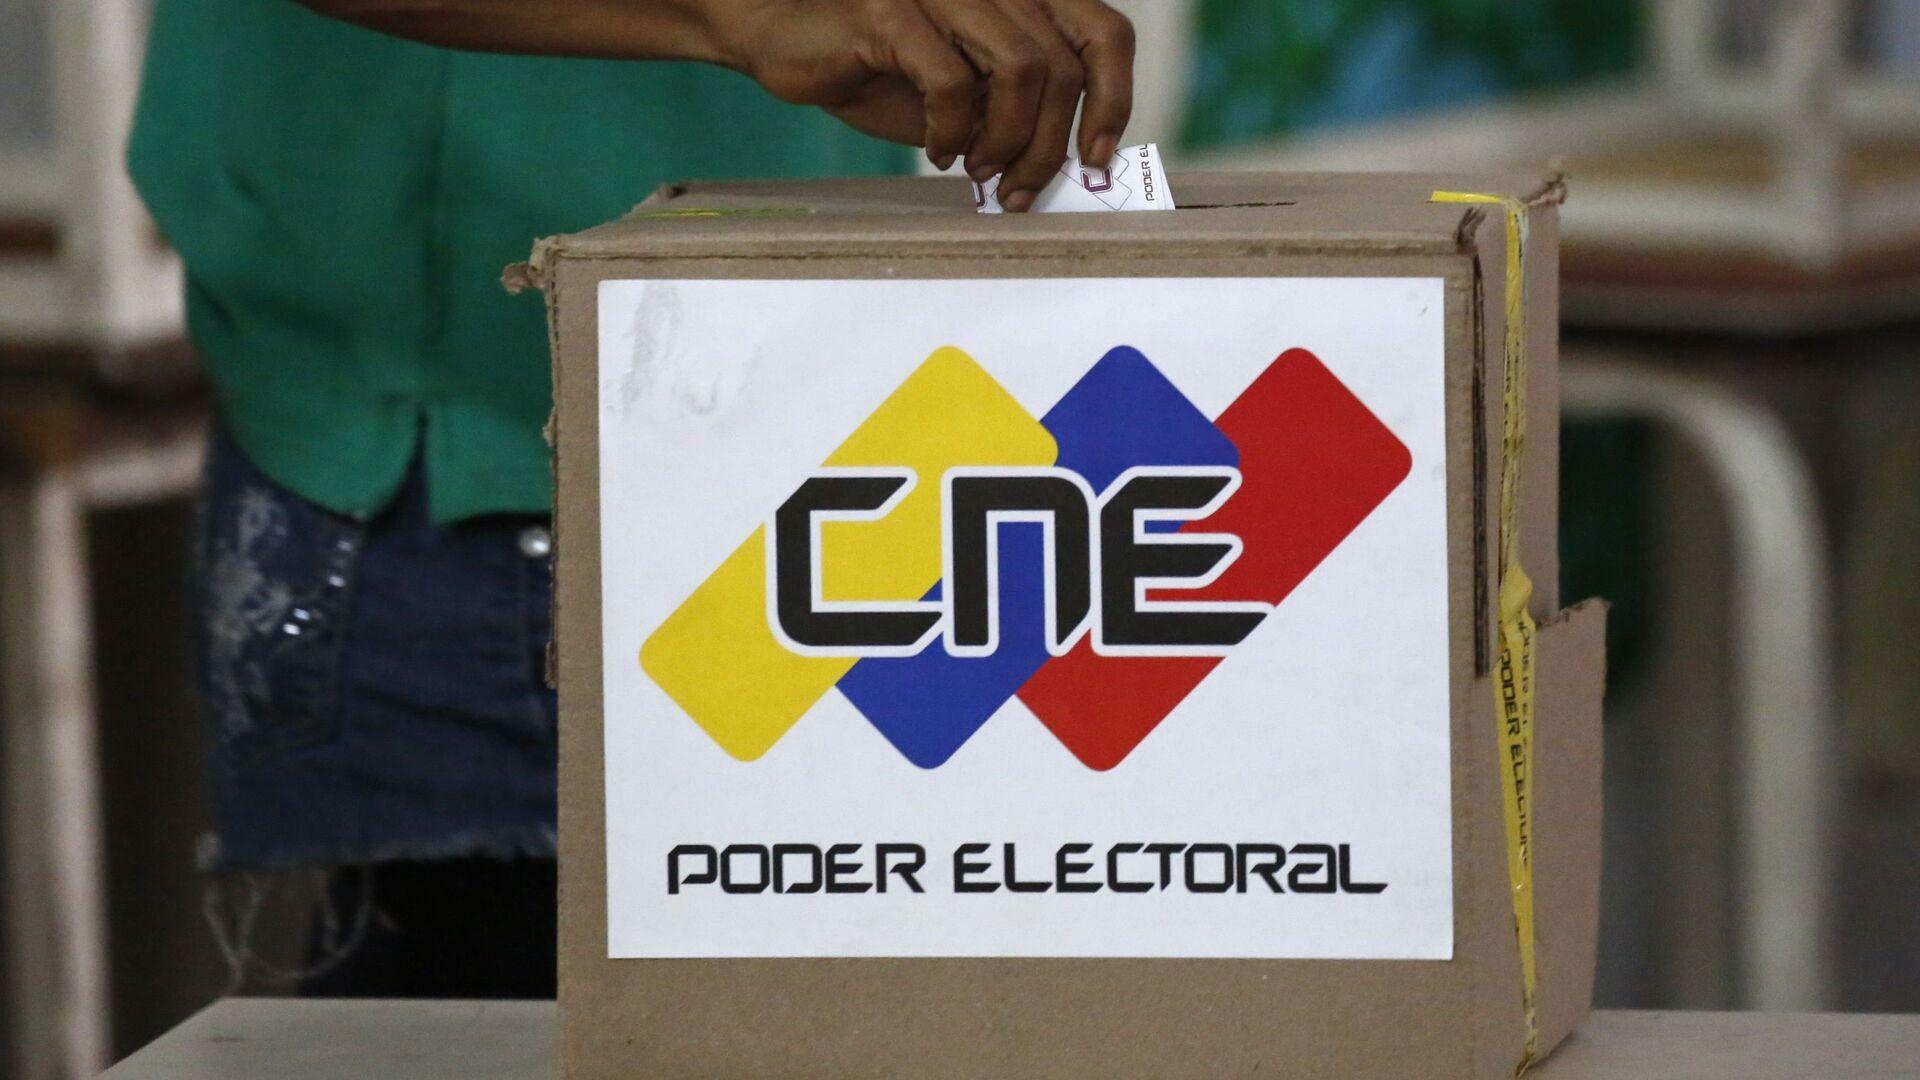 A voter casts a ballot during the Constituent Assembly election in Caracas, Venezuela - Sputnik Mundo, 1920, 14.06.2021